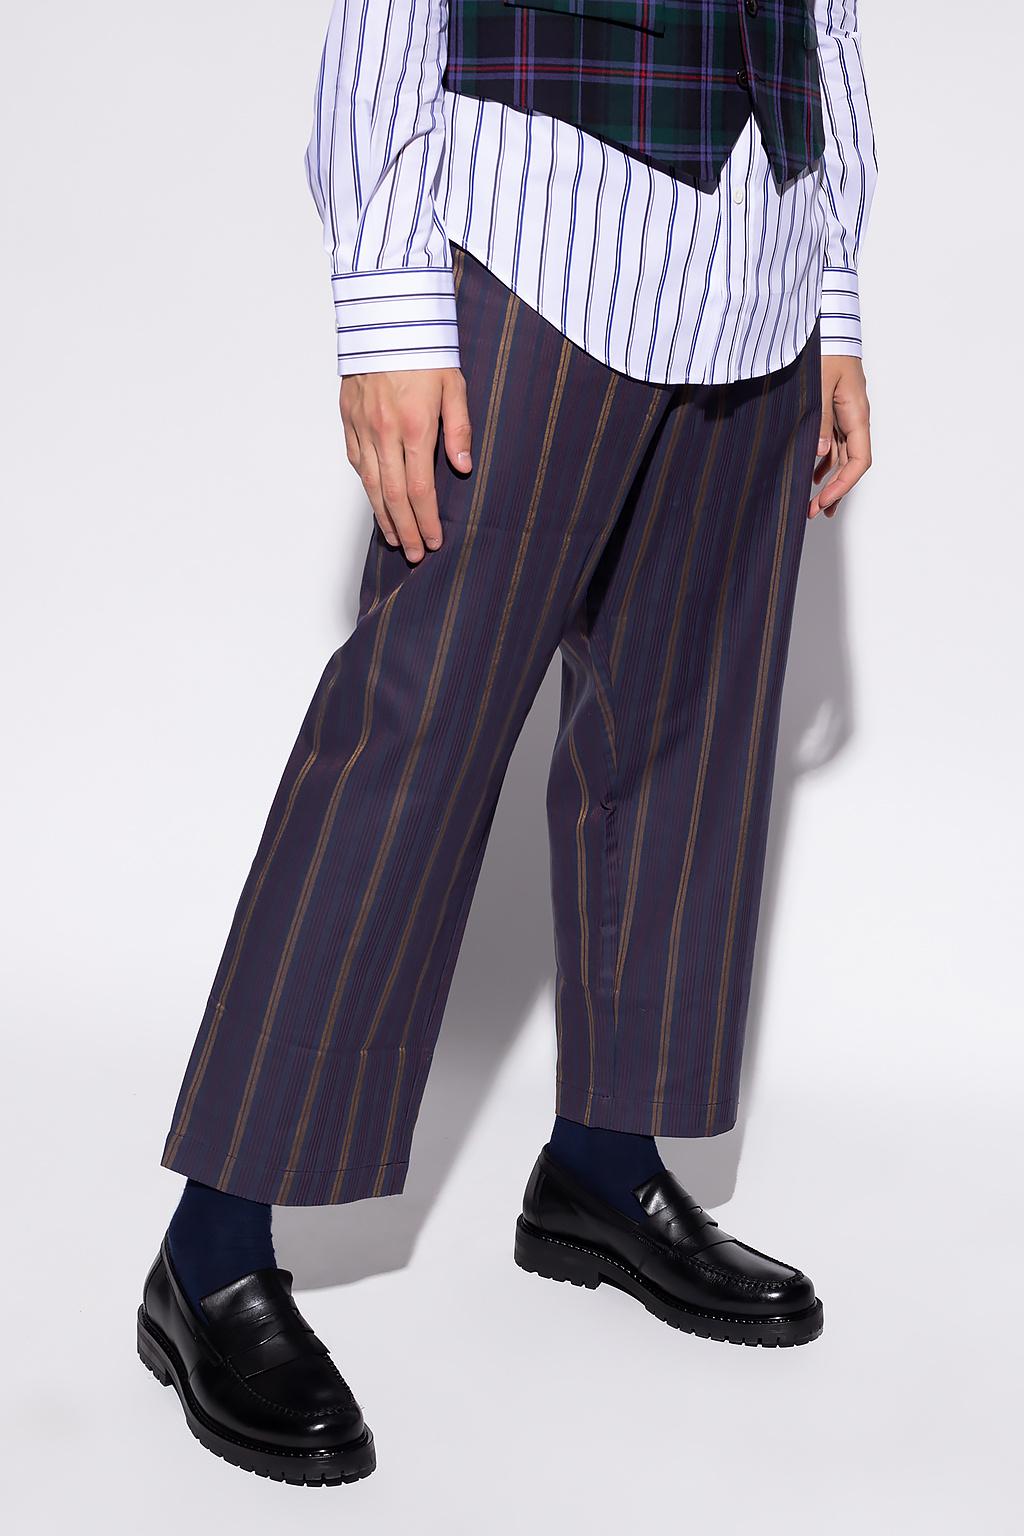 Vivienne Westwood Striped trousers